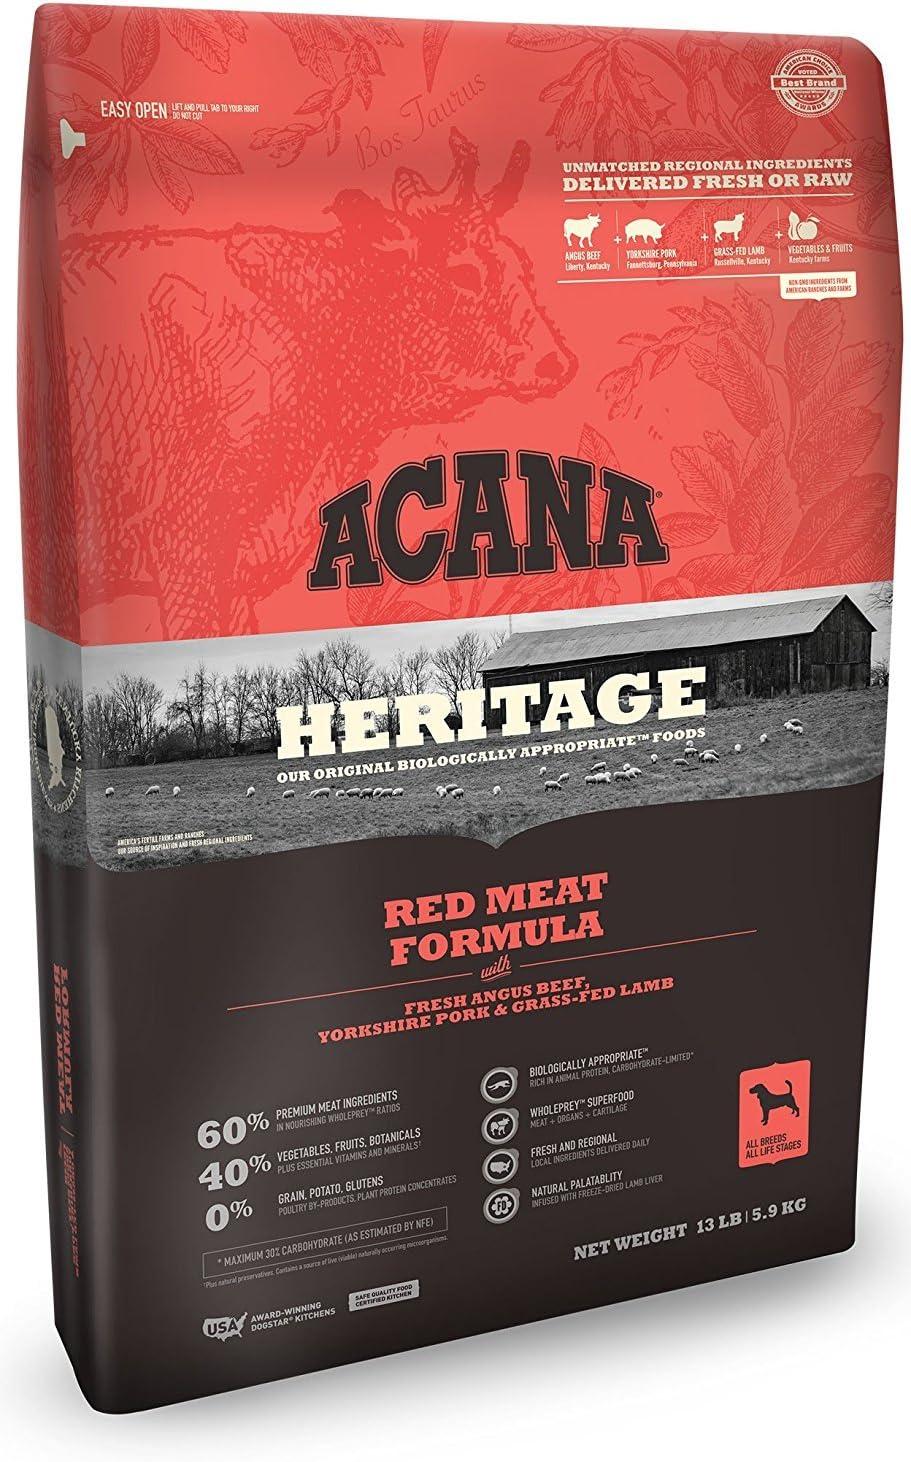 ACANA (1) 13 lb Formula Heritage Meats Dry Dog Food. 13 lb. Bag,